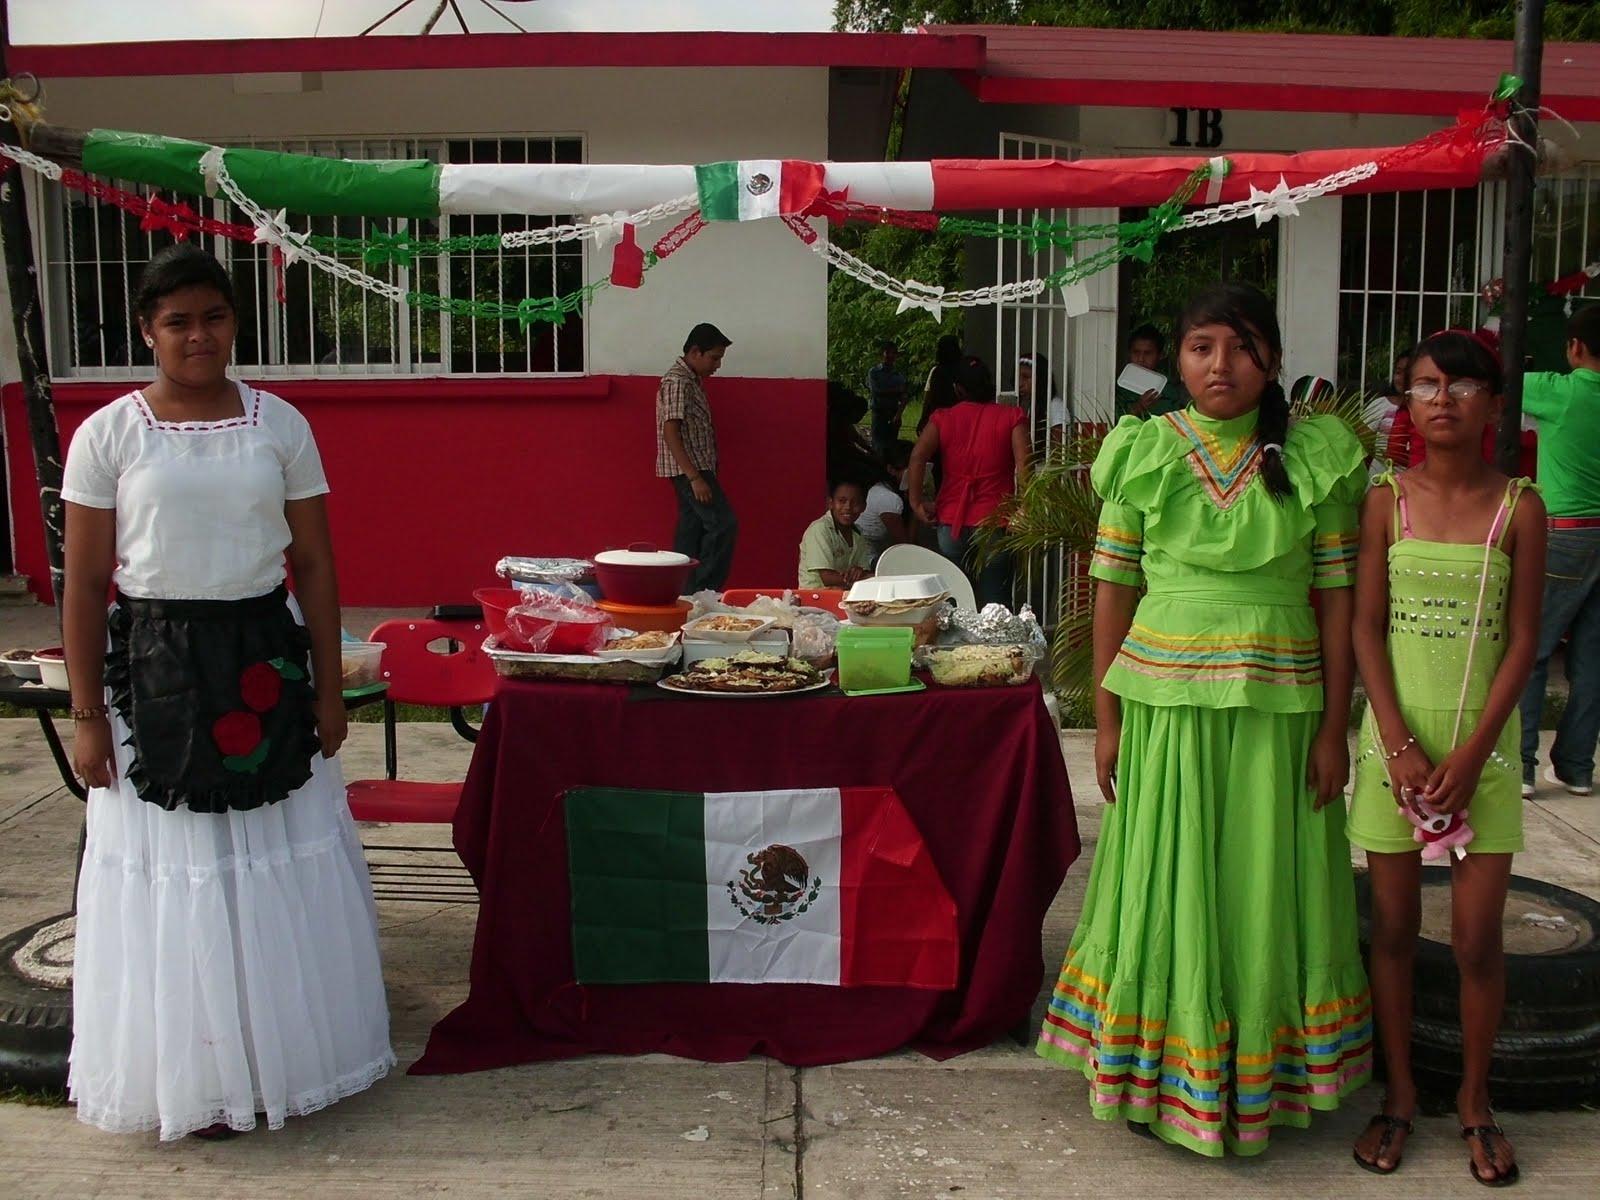 TELESECUNDARIAS ZONA 12 POZA RICA SUR: ACTIVIDADES CONMEMORATIVAS DEL ...